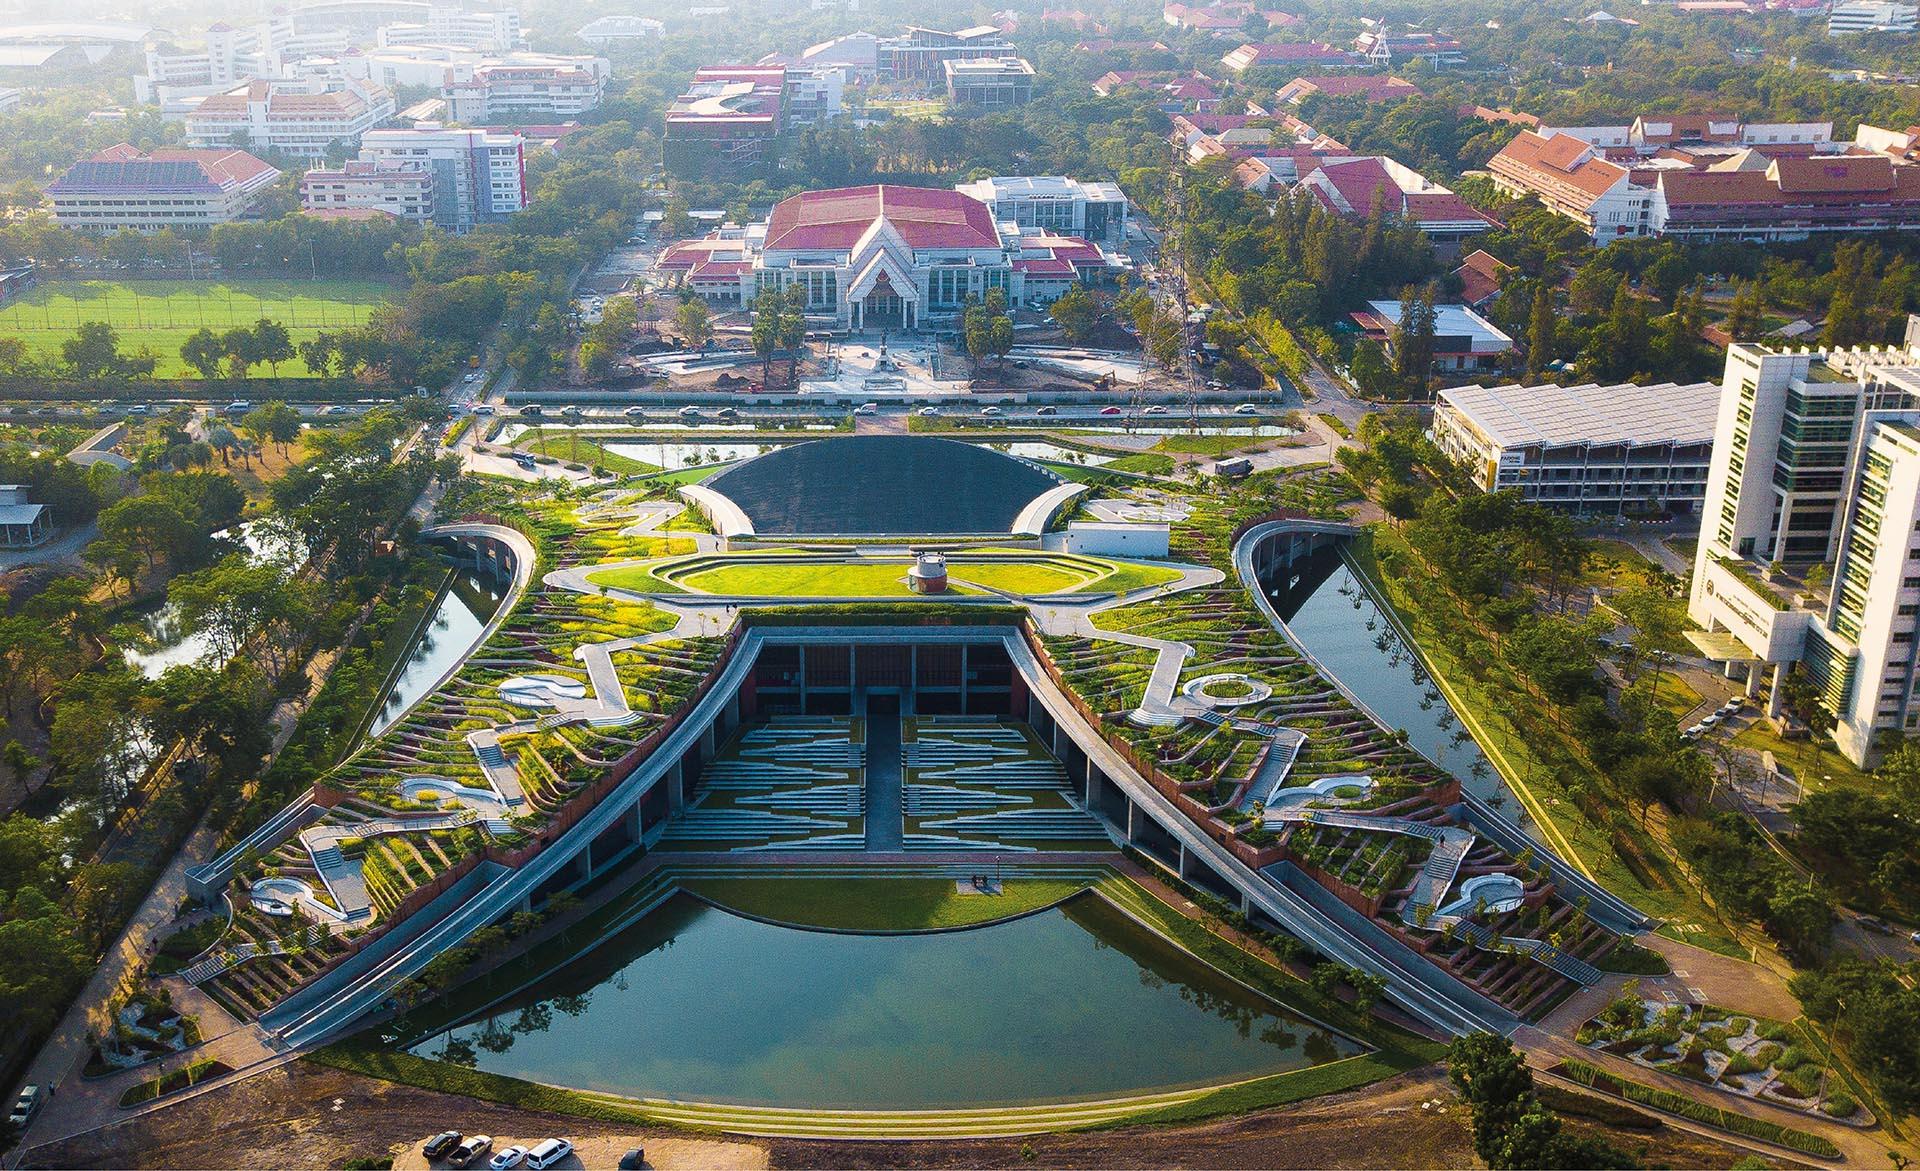 A terraced rooftop landscape design creates an urban farm in Thailand.